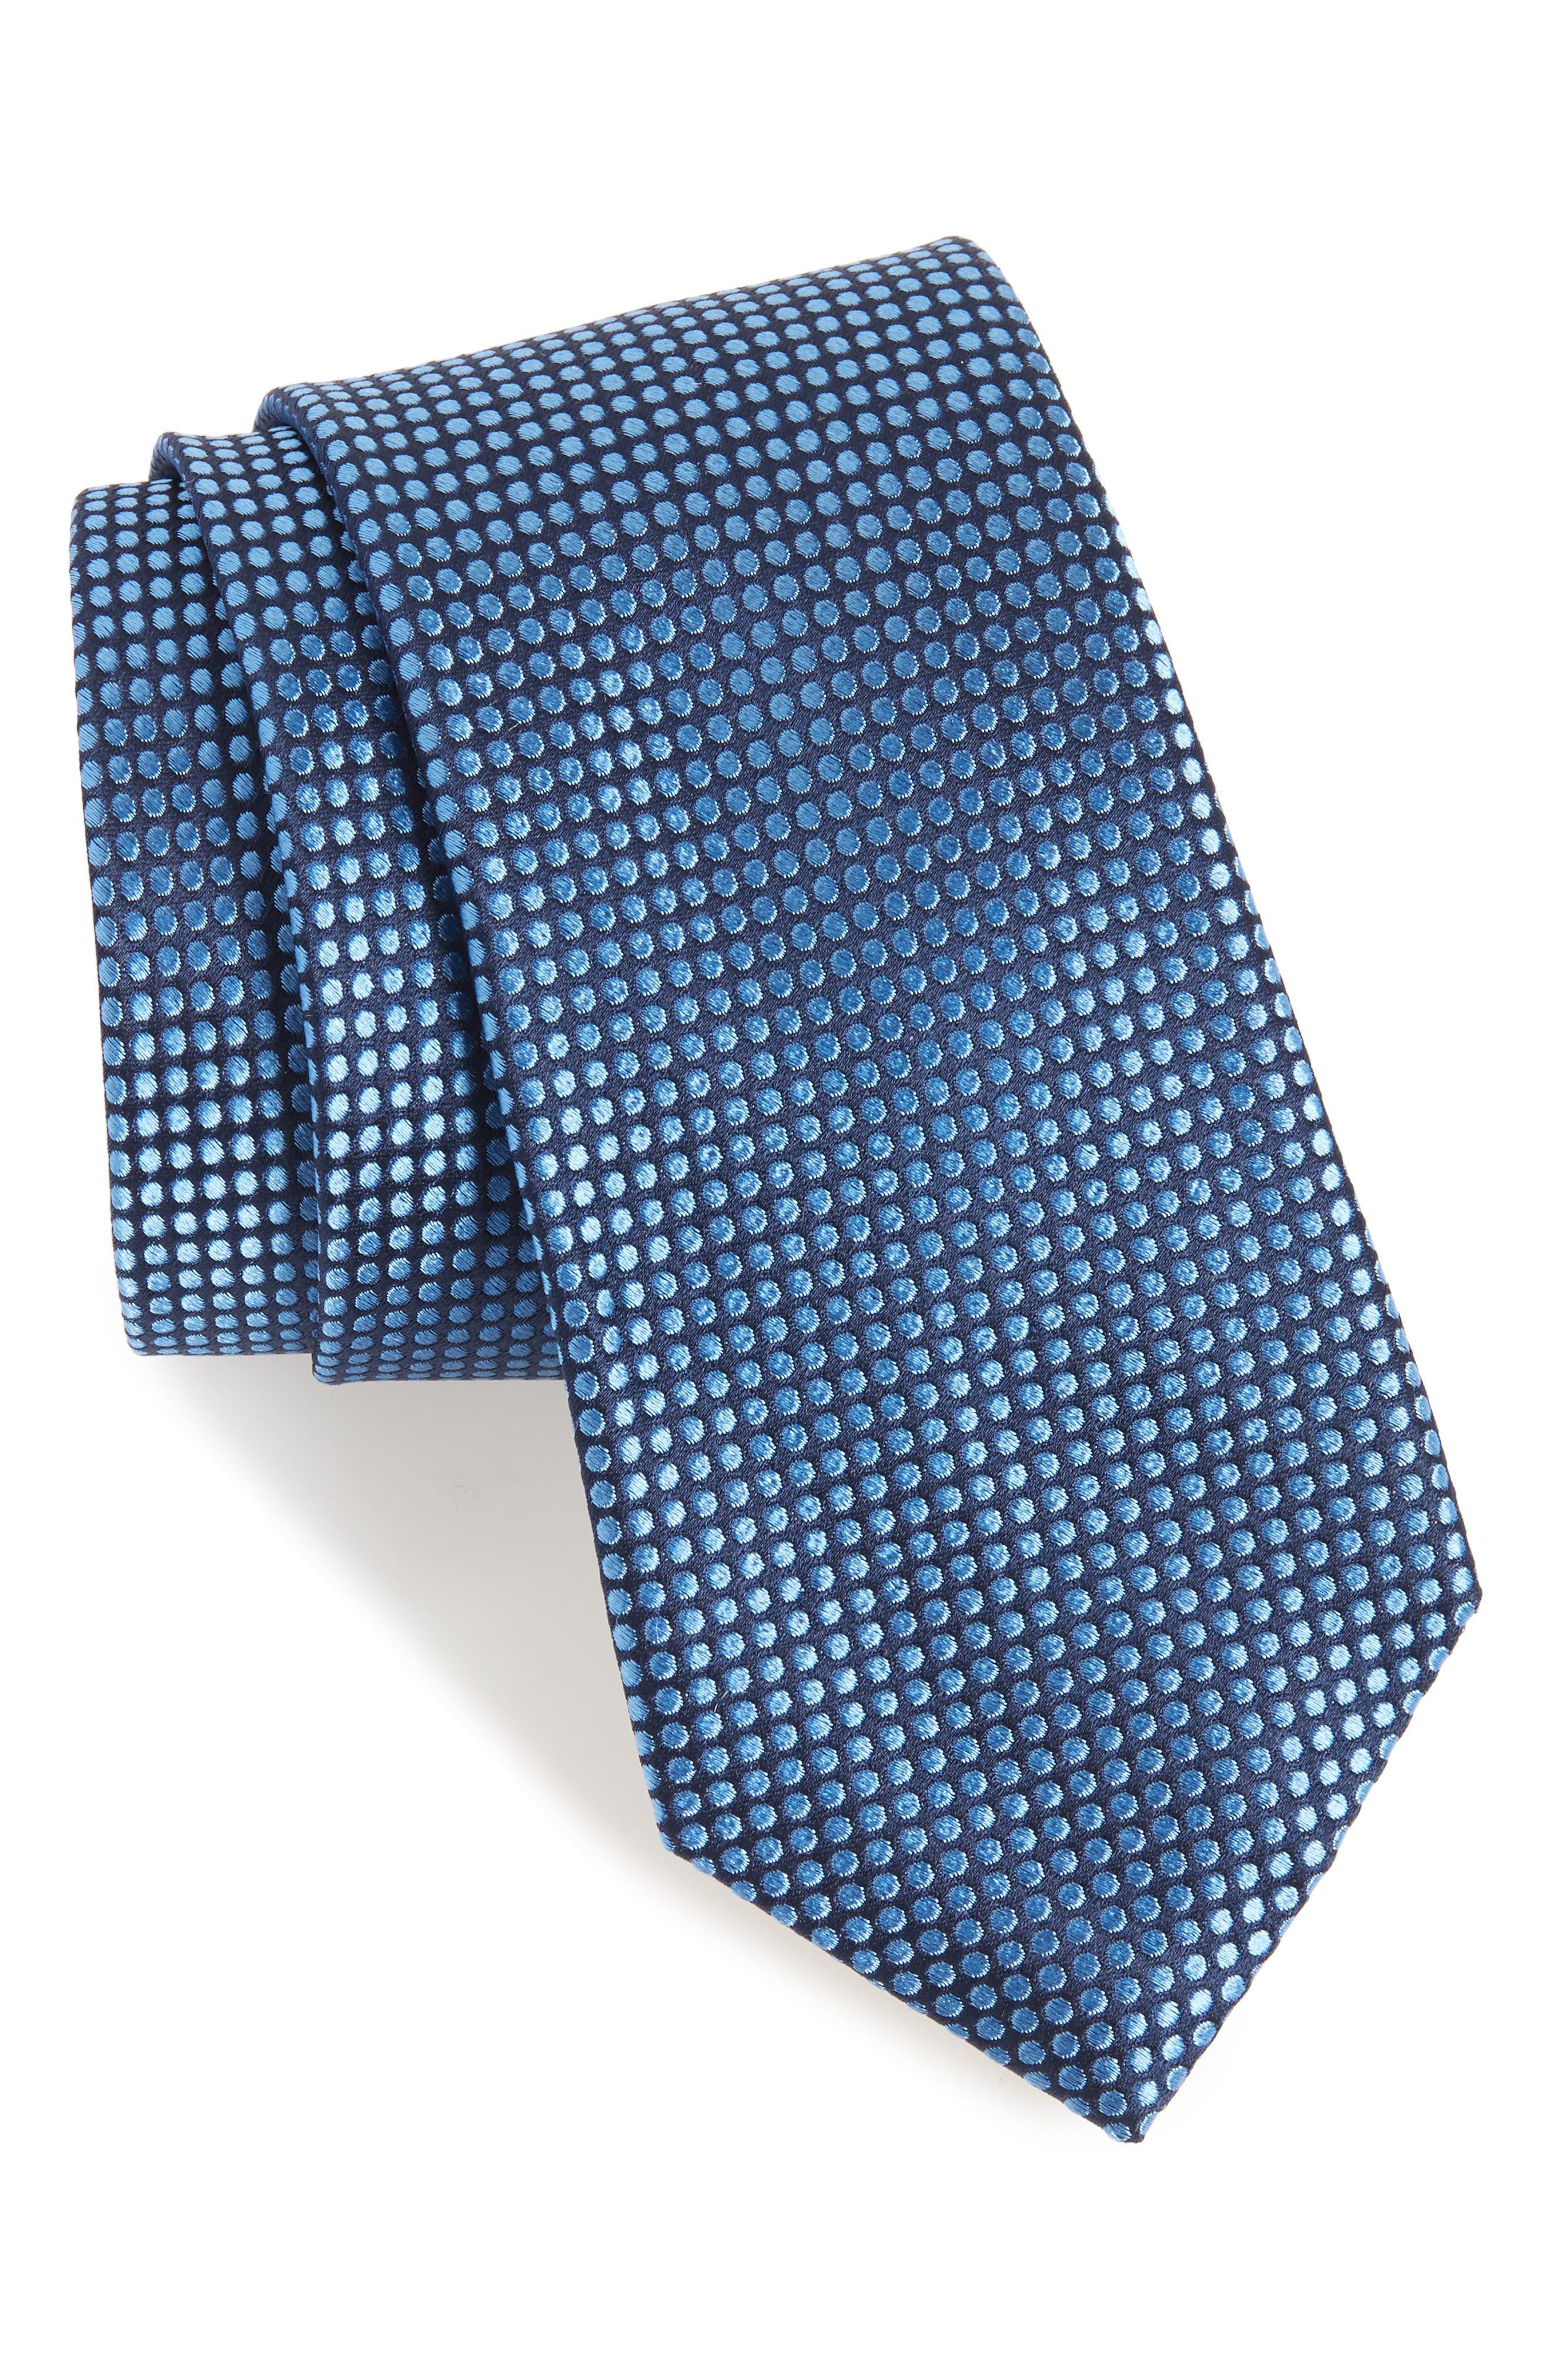 Main Image - Nordstrom Men's Shop Charlie Dots Silk Tie